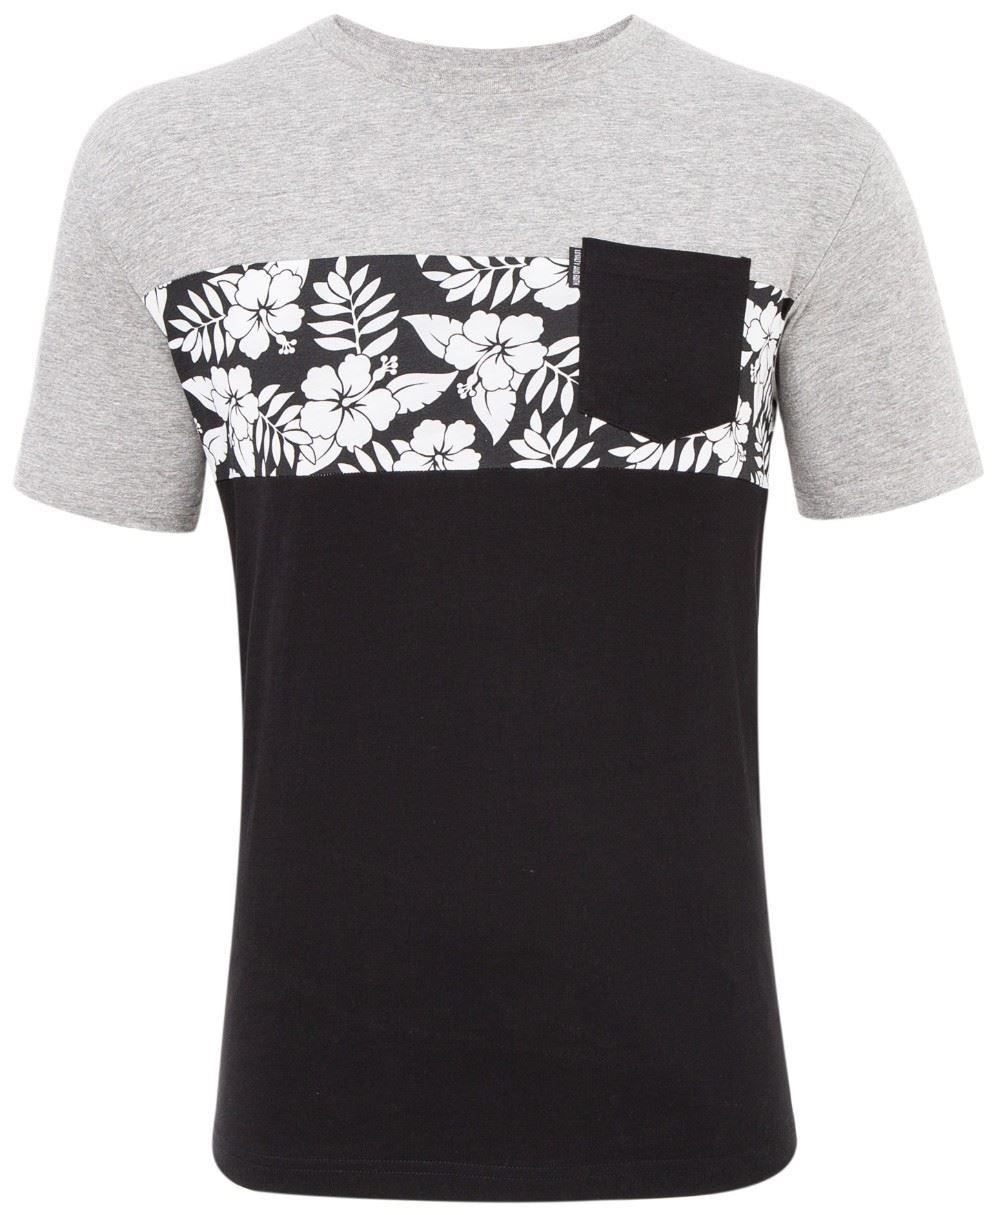 Loyalty & Faith Delap T-Shirt - Black